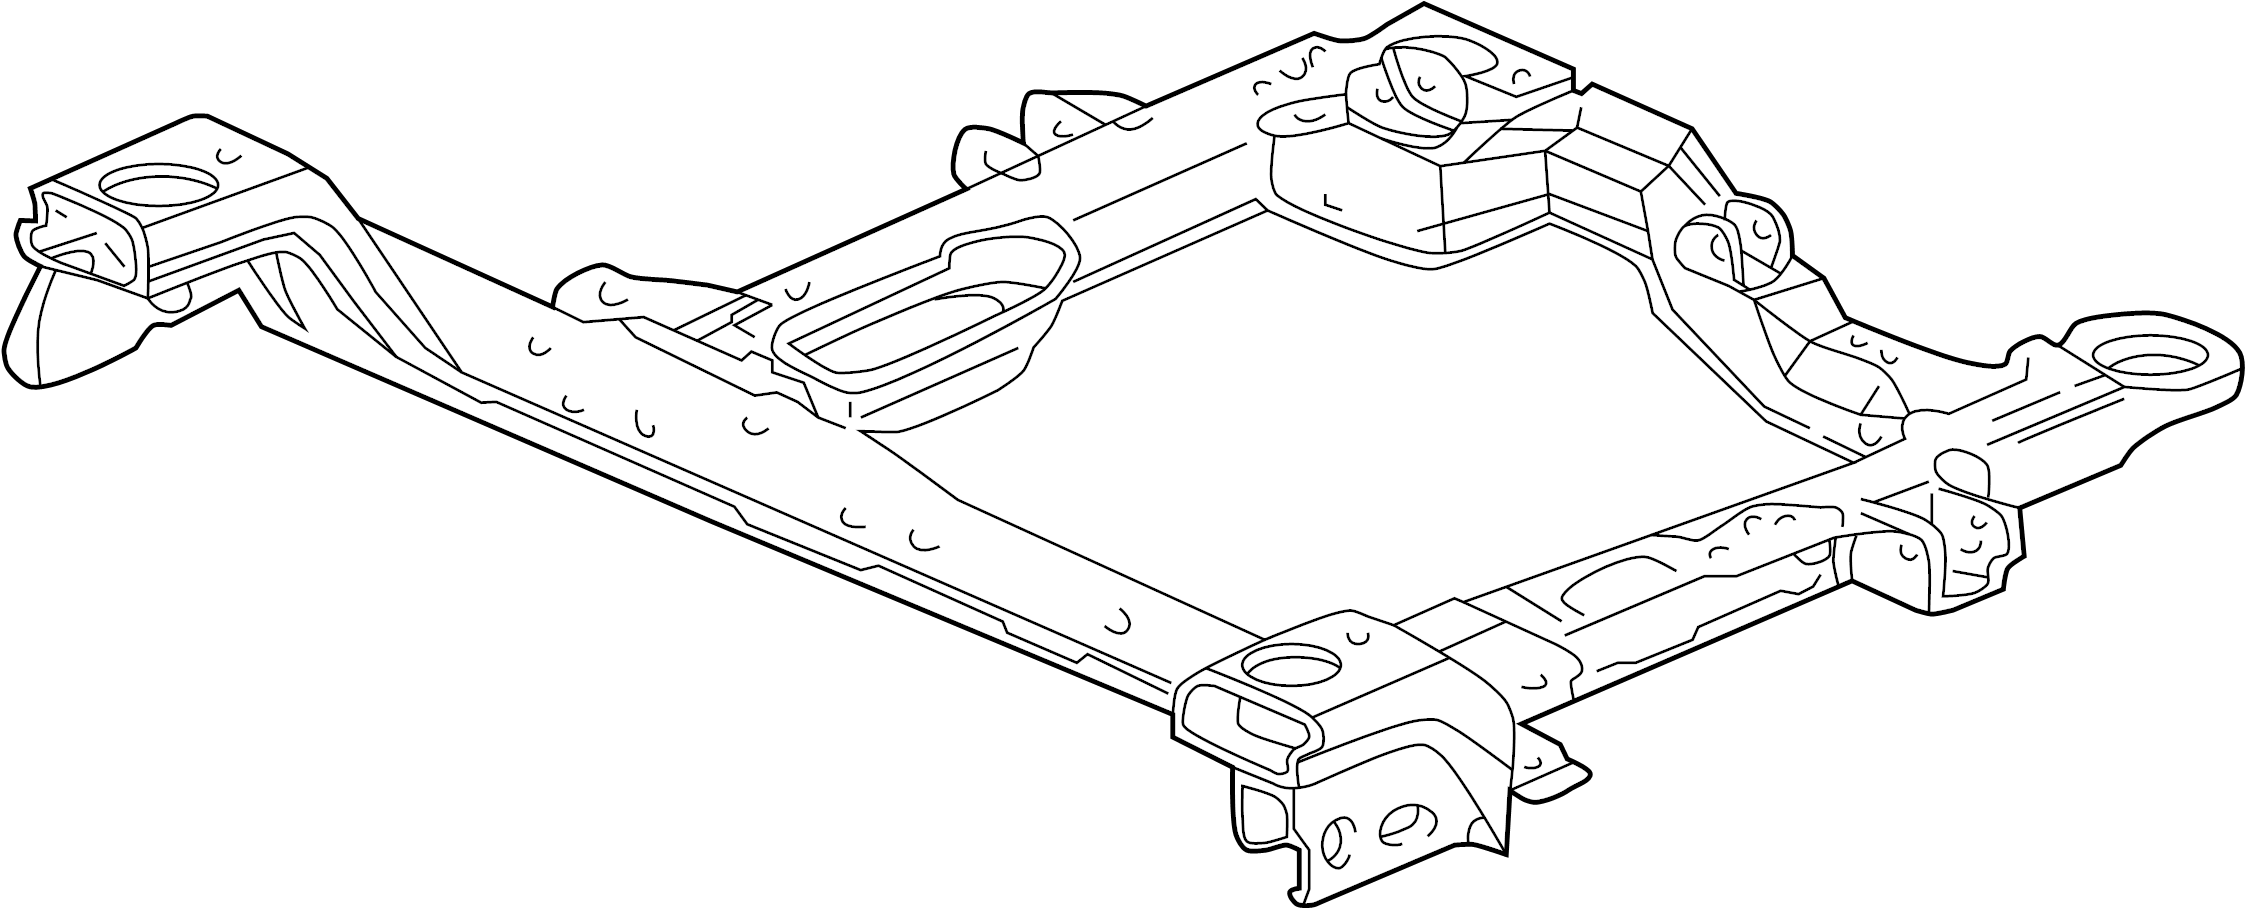 Pontiac Grand Prix Engine Cradle (Front). 3.8 & 3.6 liter